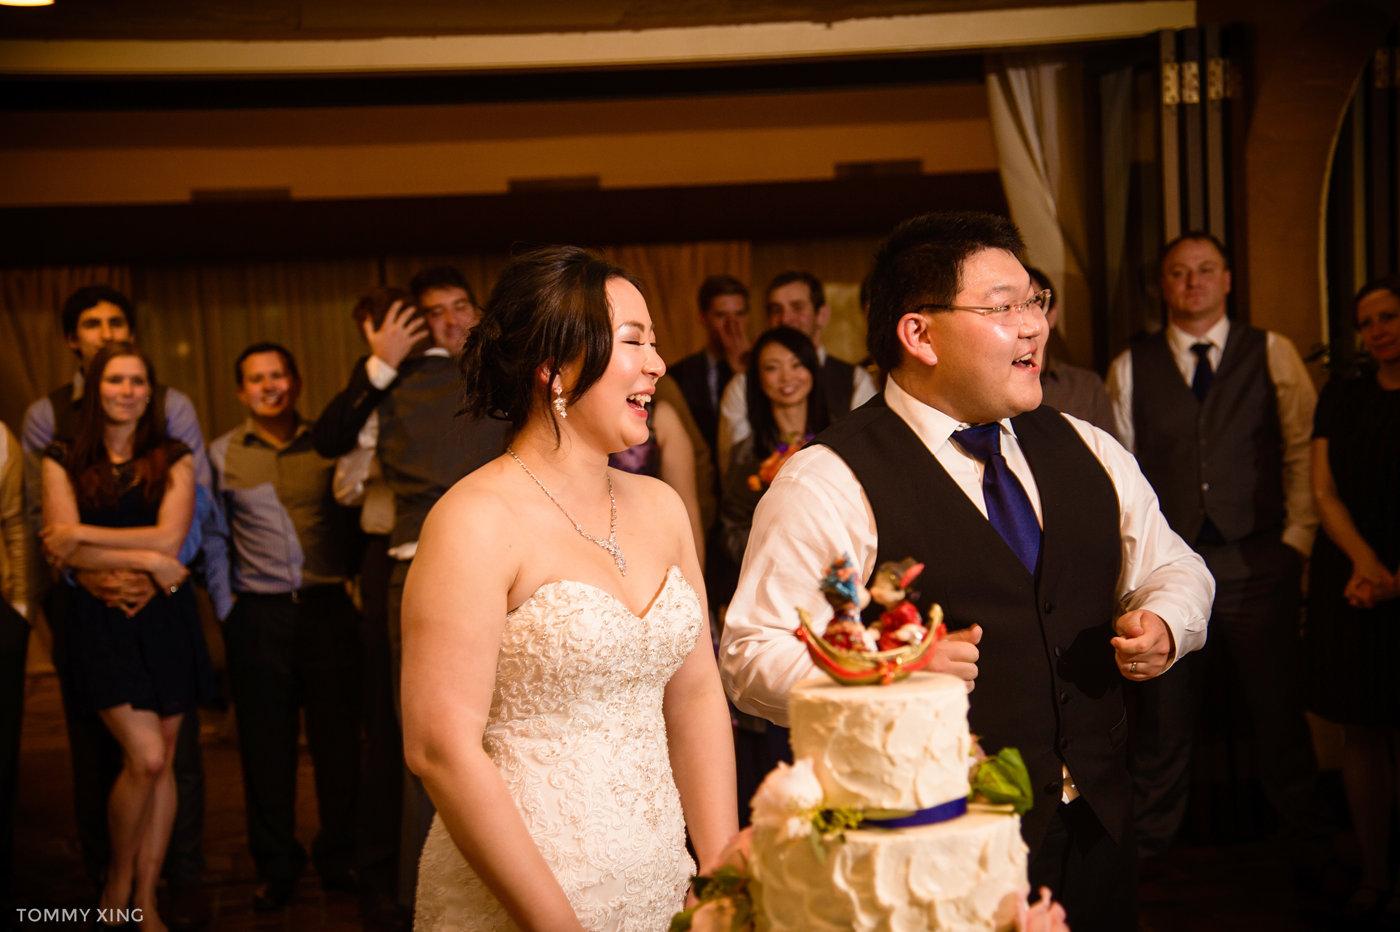 STANFORD MEMORIAL CHURCH WEDDING - Wenjie & Chengcheng - SAN FRANCISCO BAY AREA 斯坦福教堂婚礼跟拍 - 洛杉矶婚礼婚纱照摄影师 Tommy Xing Photography241.jpg